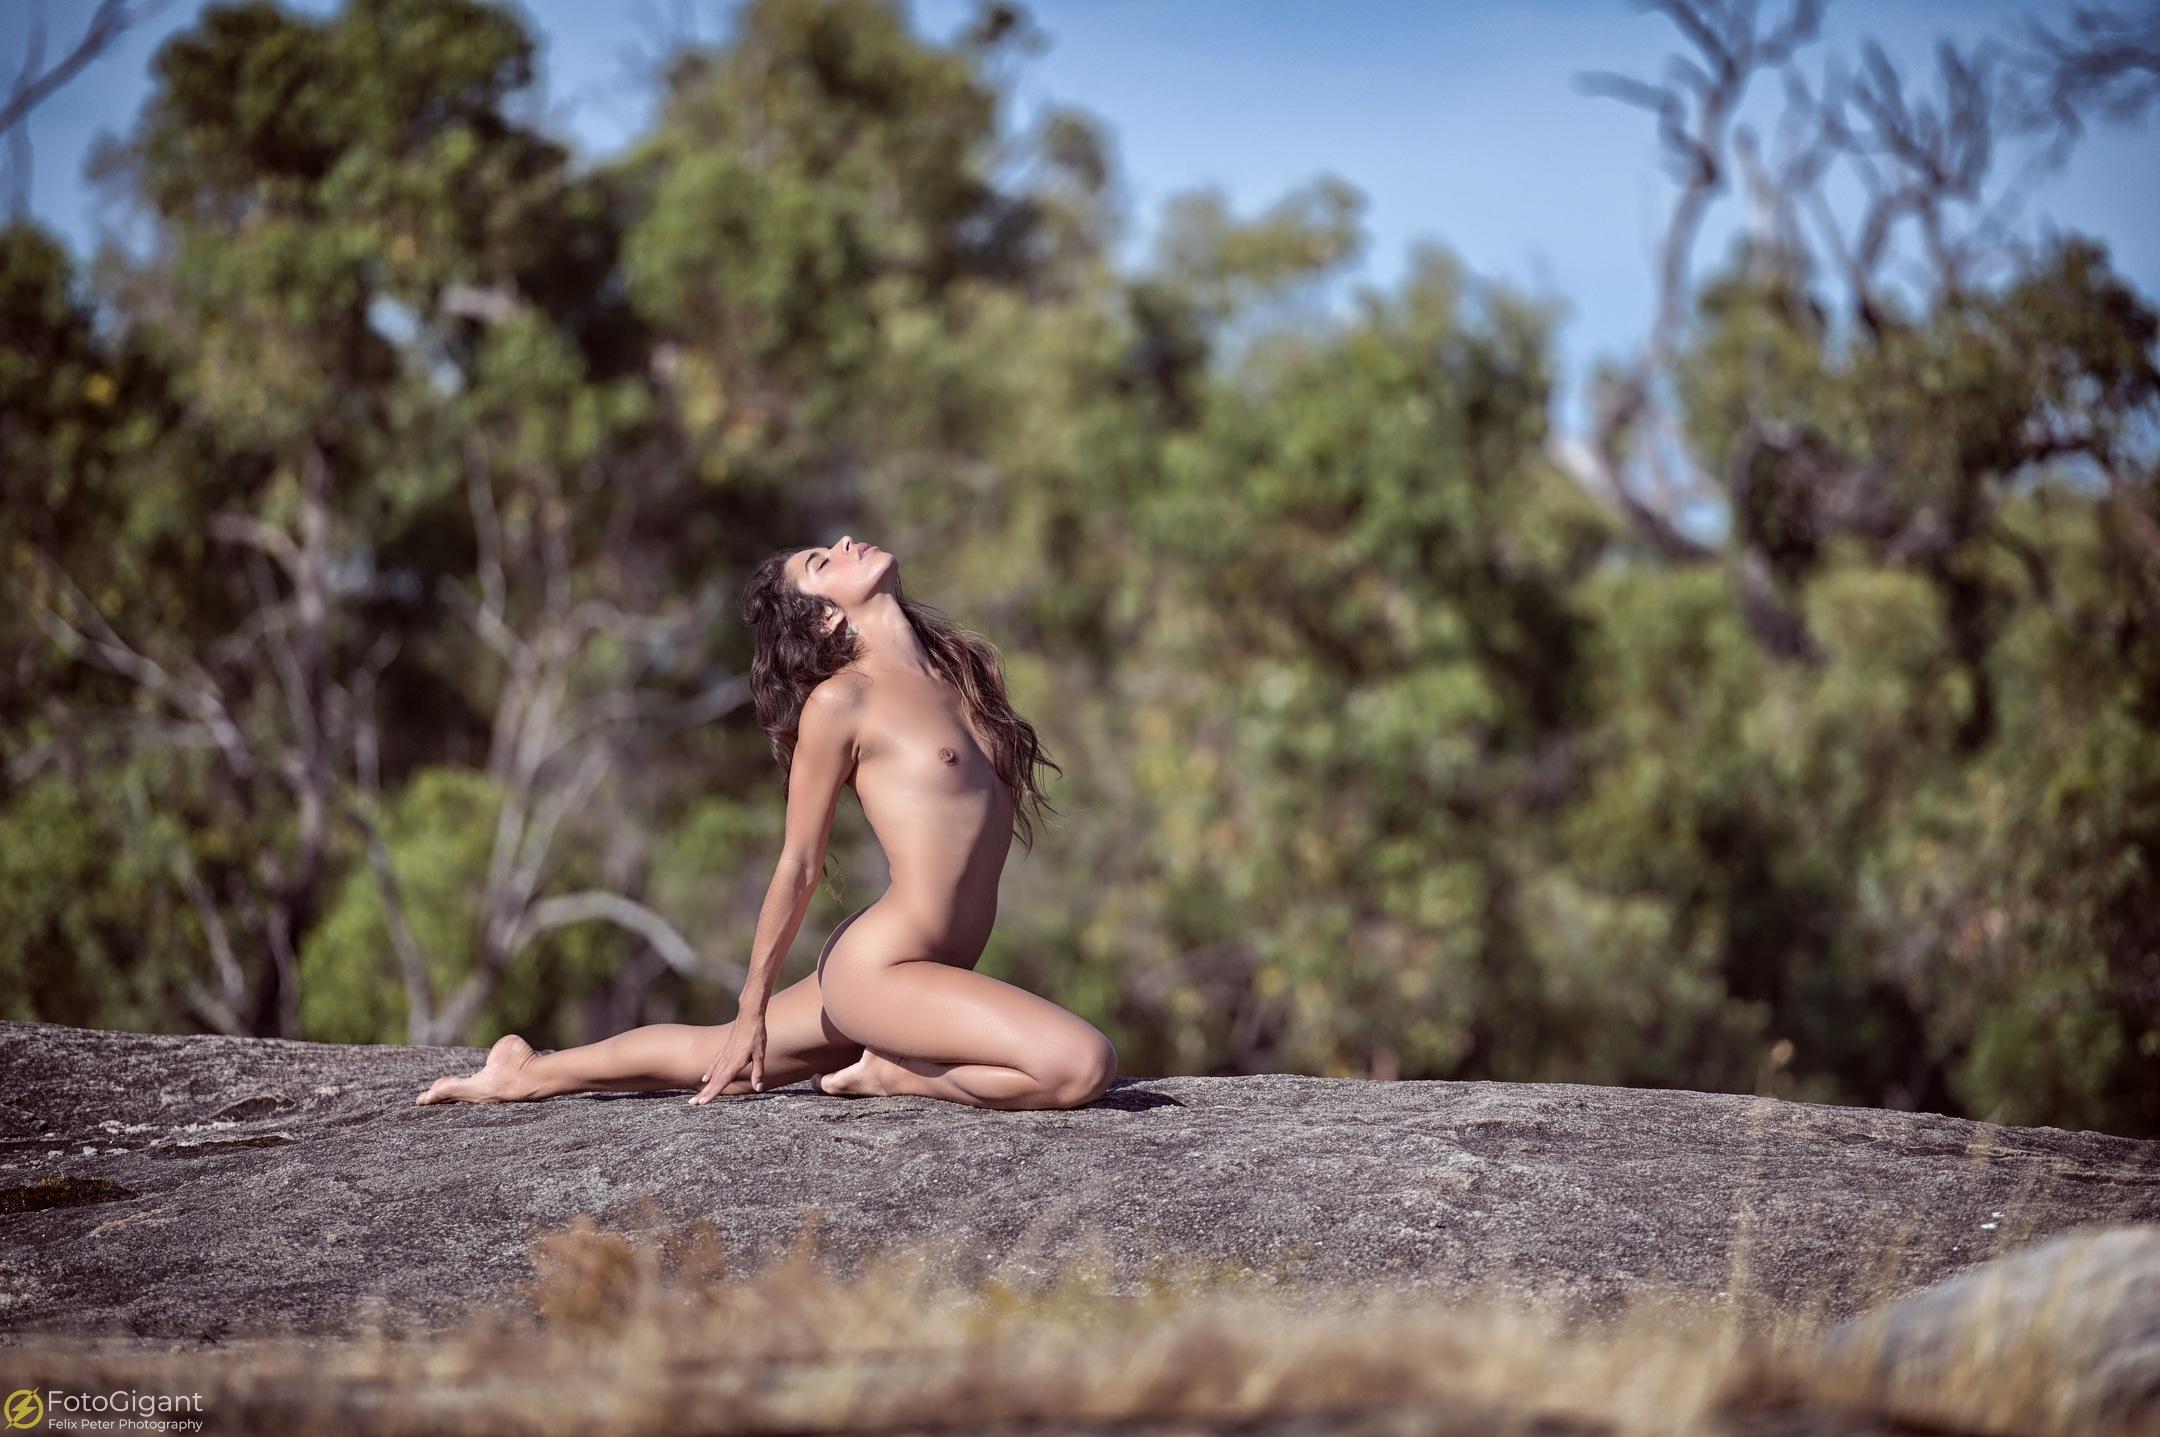 NudeArt_Aktfotografie_Eva-Luna_22.jpg